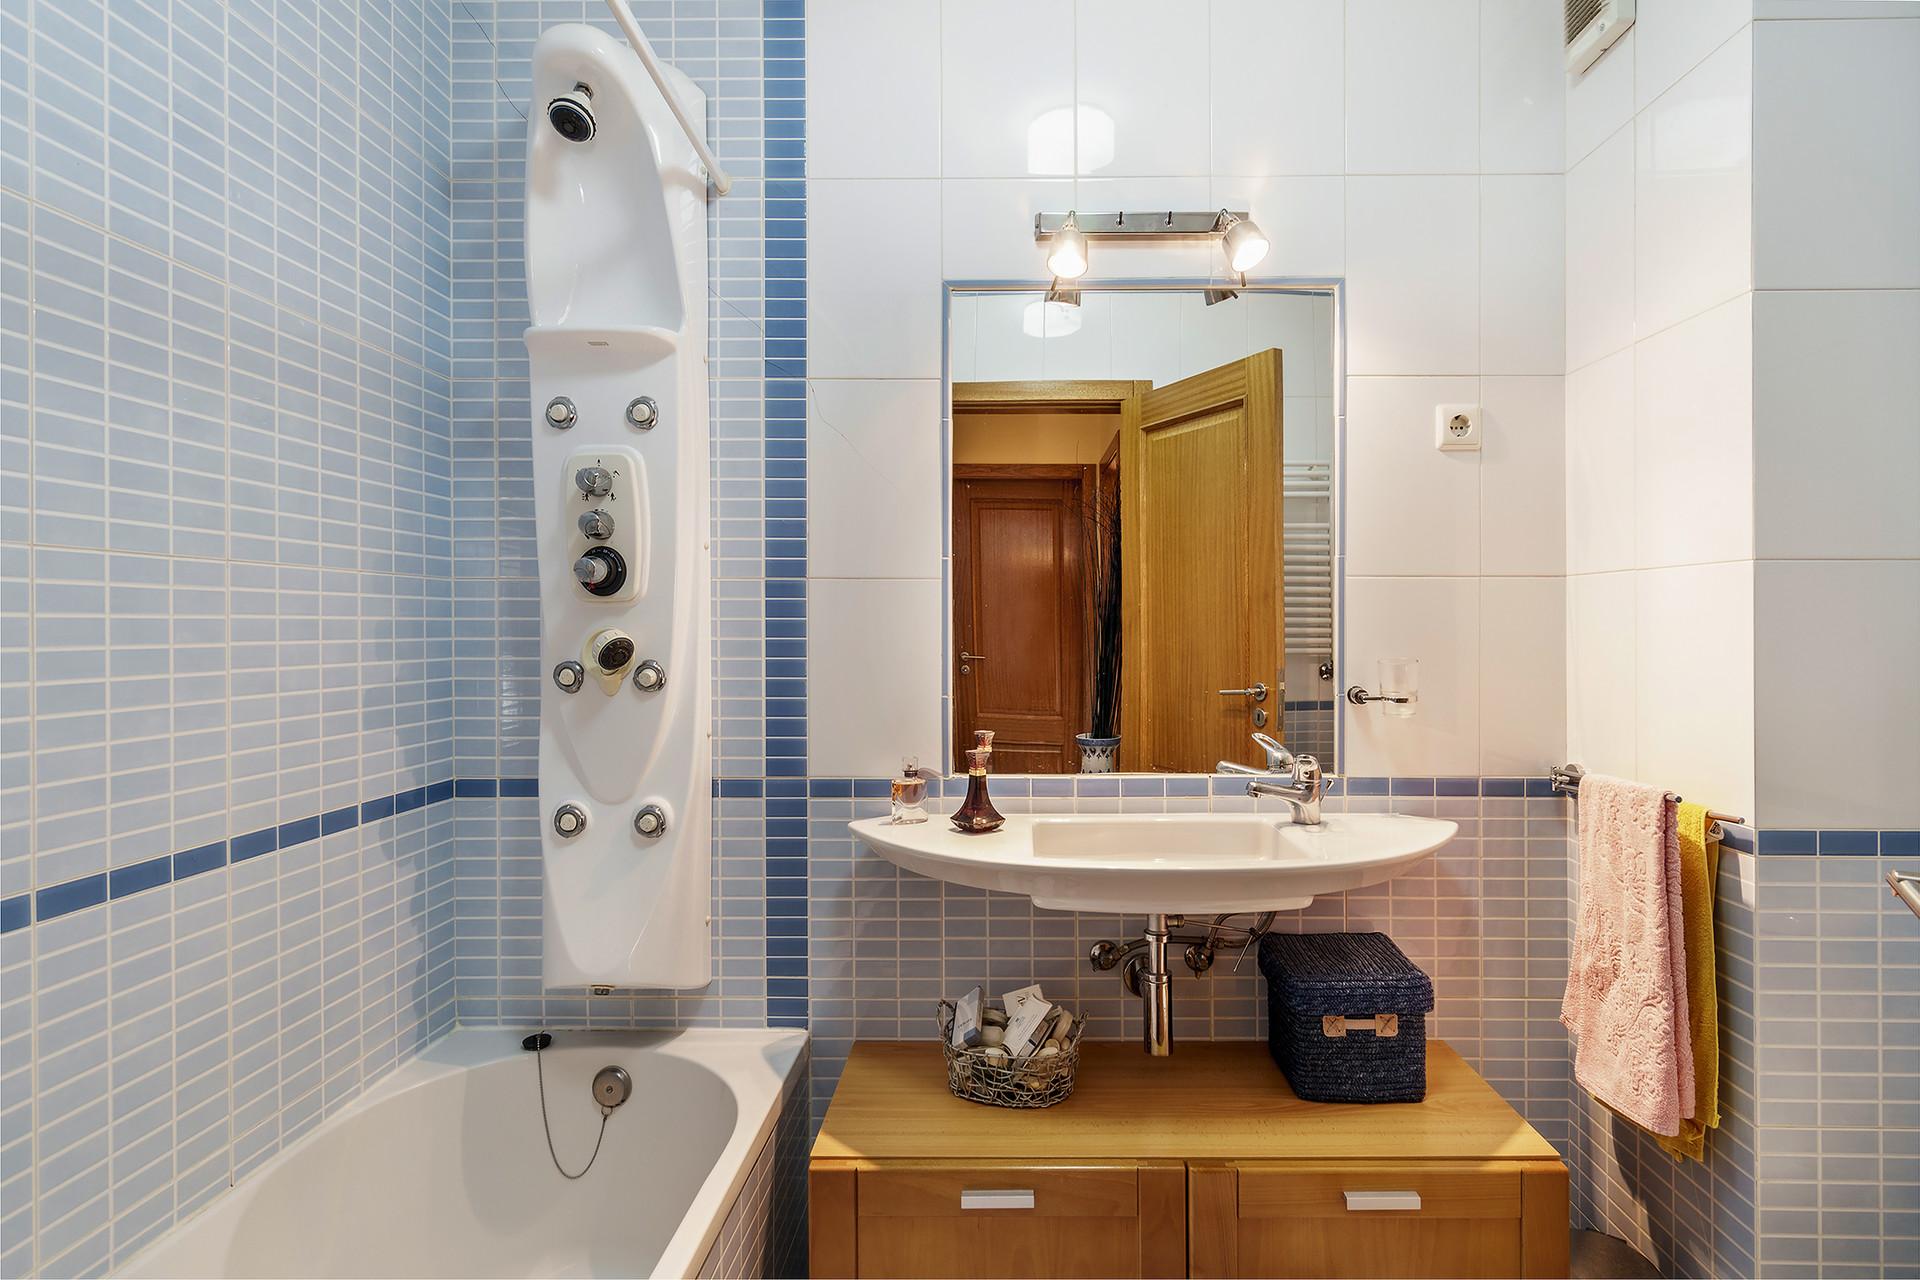 quarto-casa-de-banho-completa-privativa-e301937f3811571532540f6e928078b1.jpg